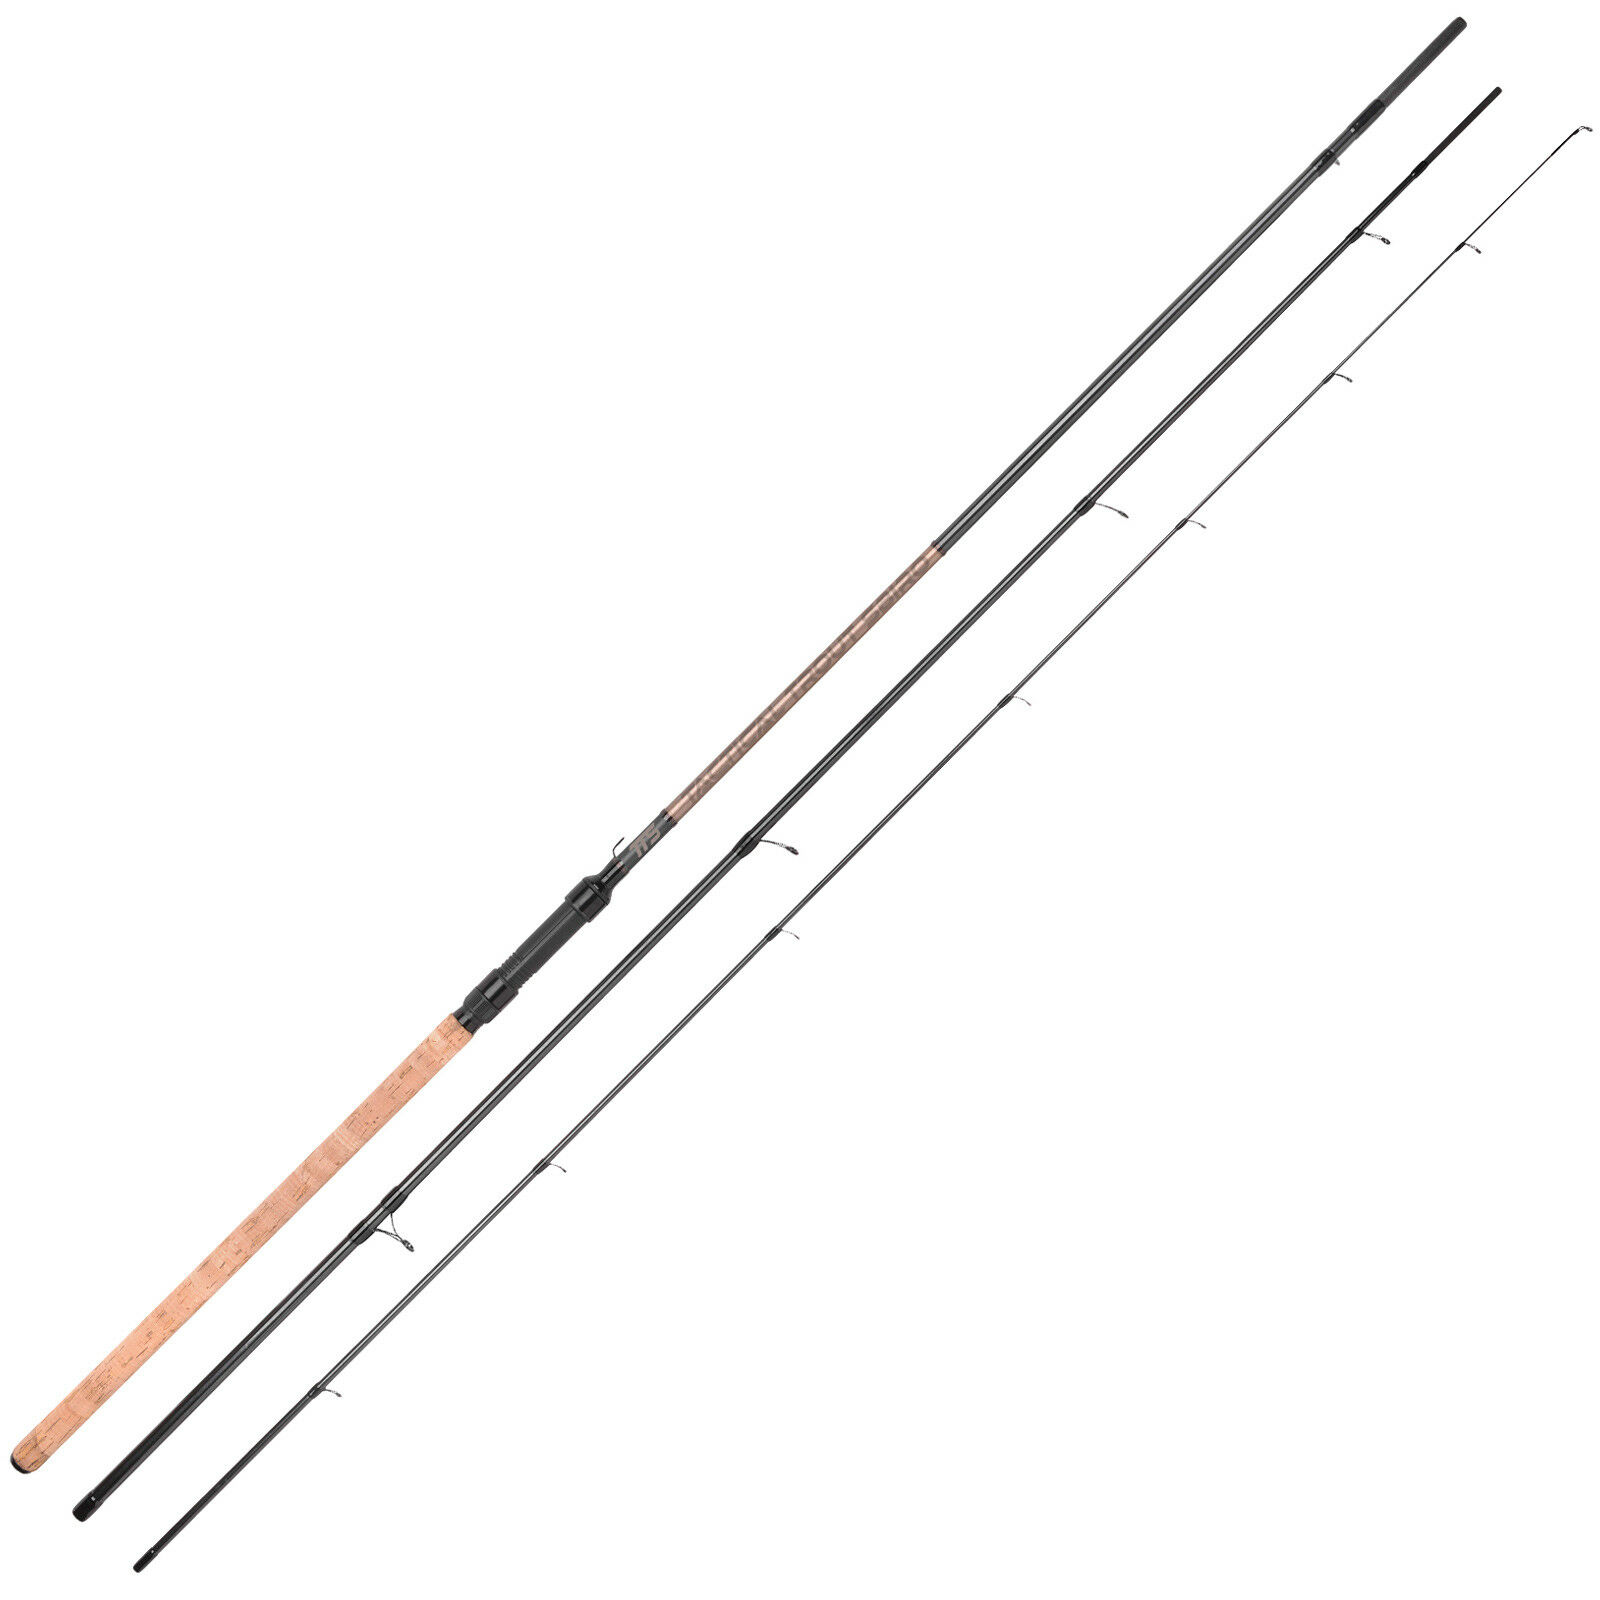 Spro Sbirolinorute Forellenrute Forelle angeln -Tactical Trout Sbiro 3,30m 3-25g